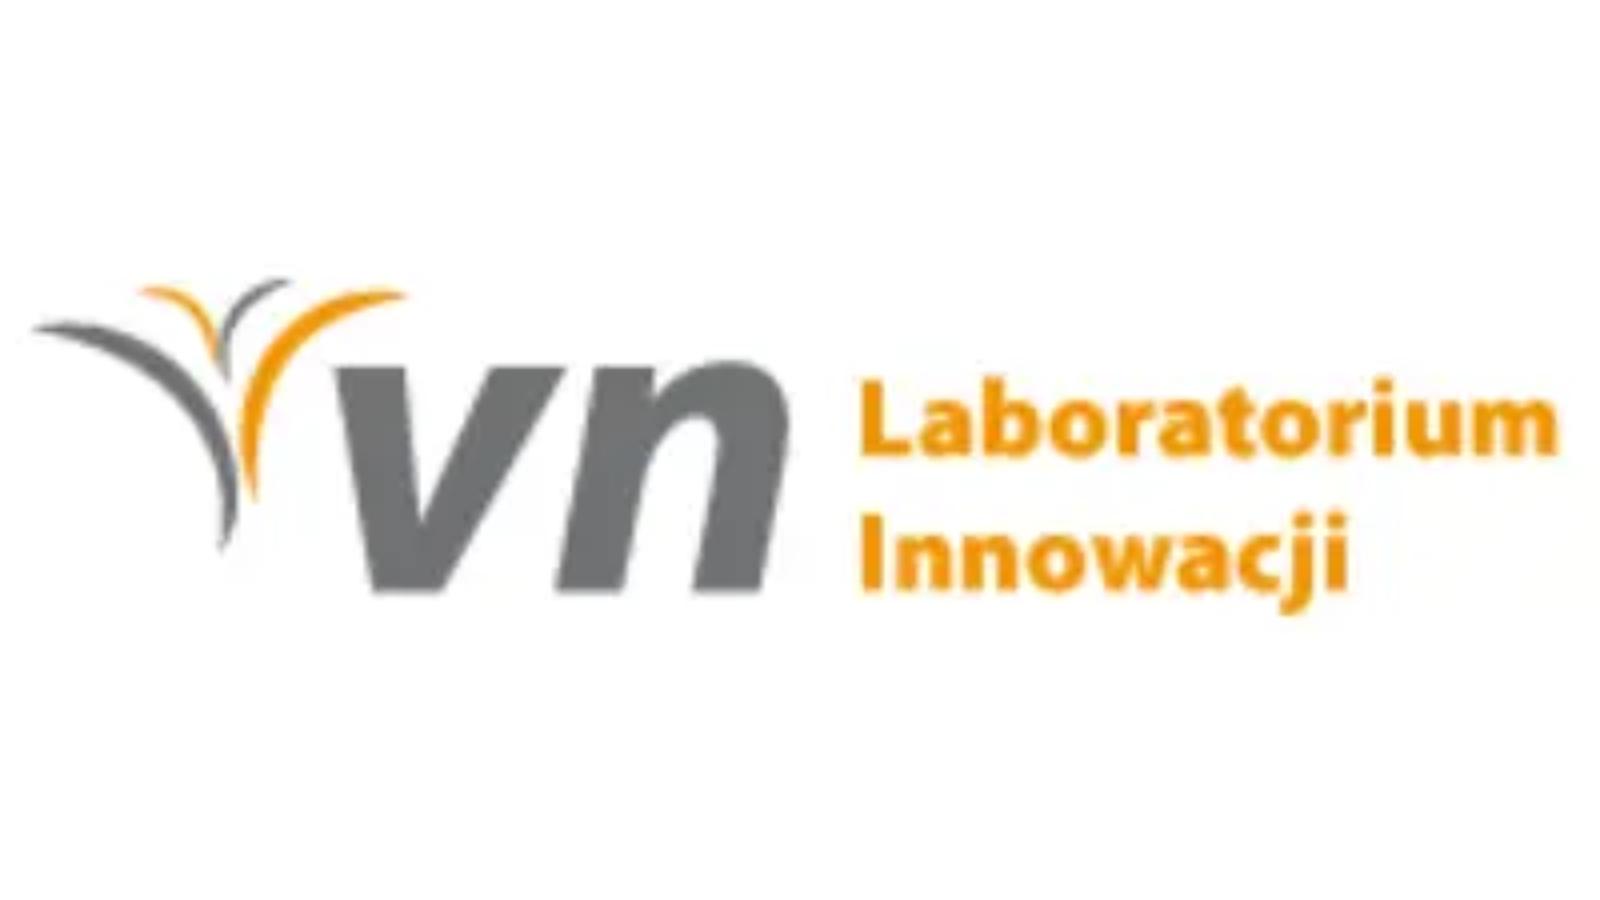 Vn_laboratorium_innowacji_logo